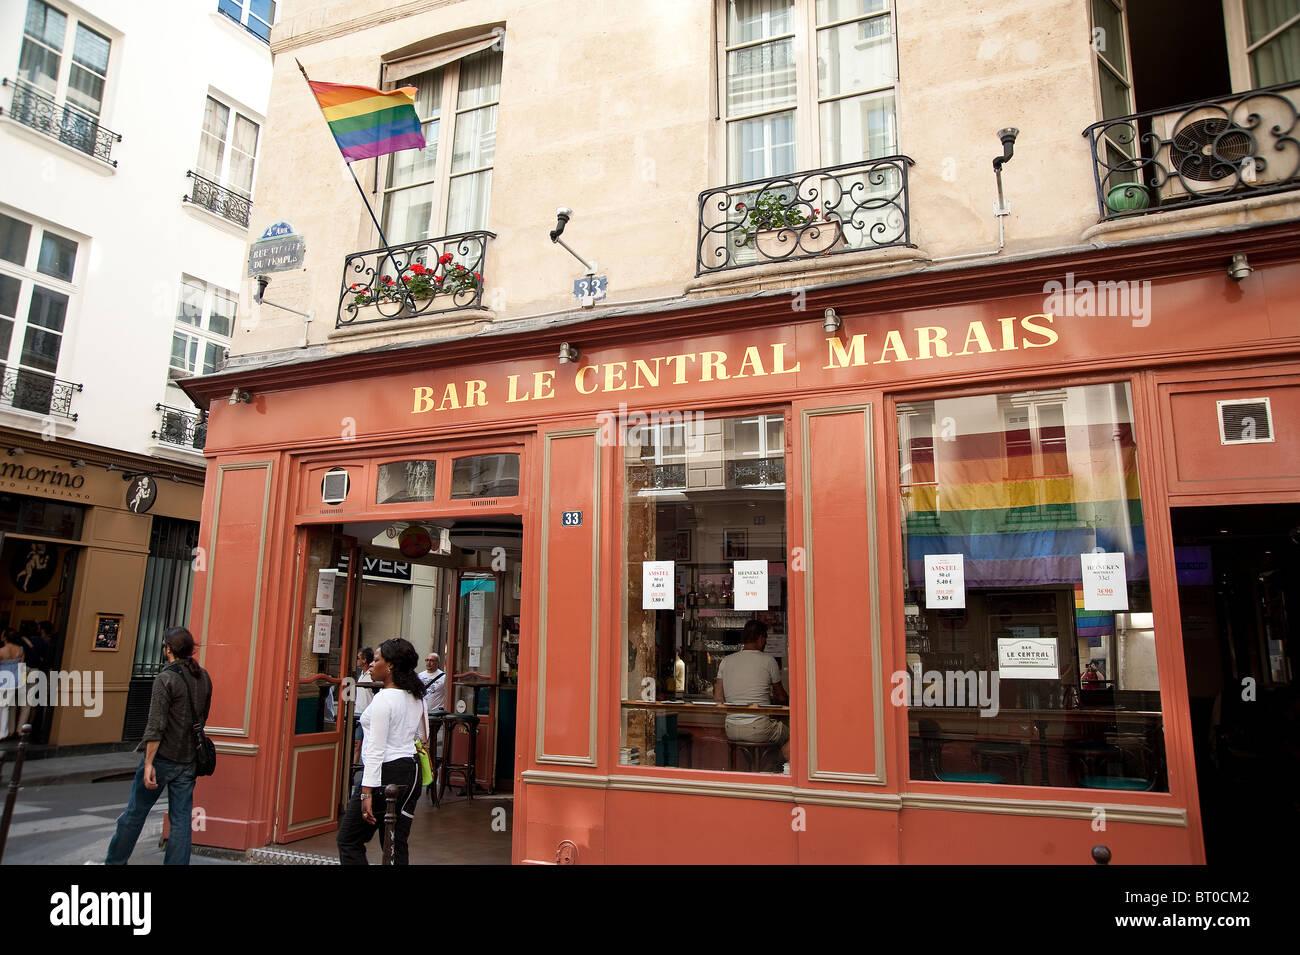 Bar le central in the marais district paris france stock photo royalty free image 31972082 - Bar le central ...